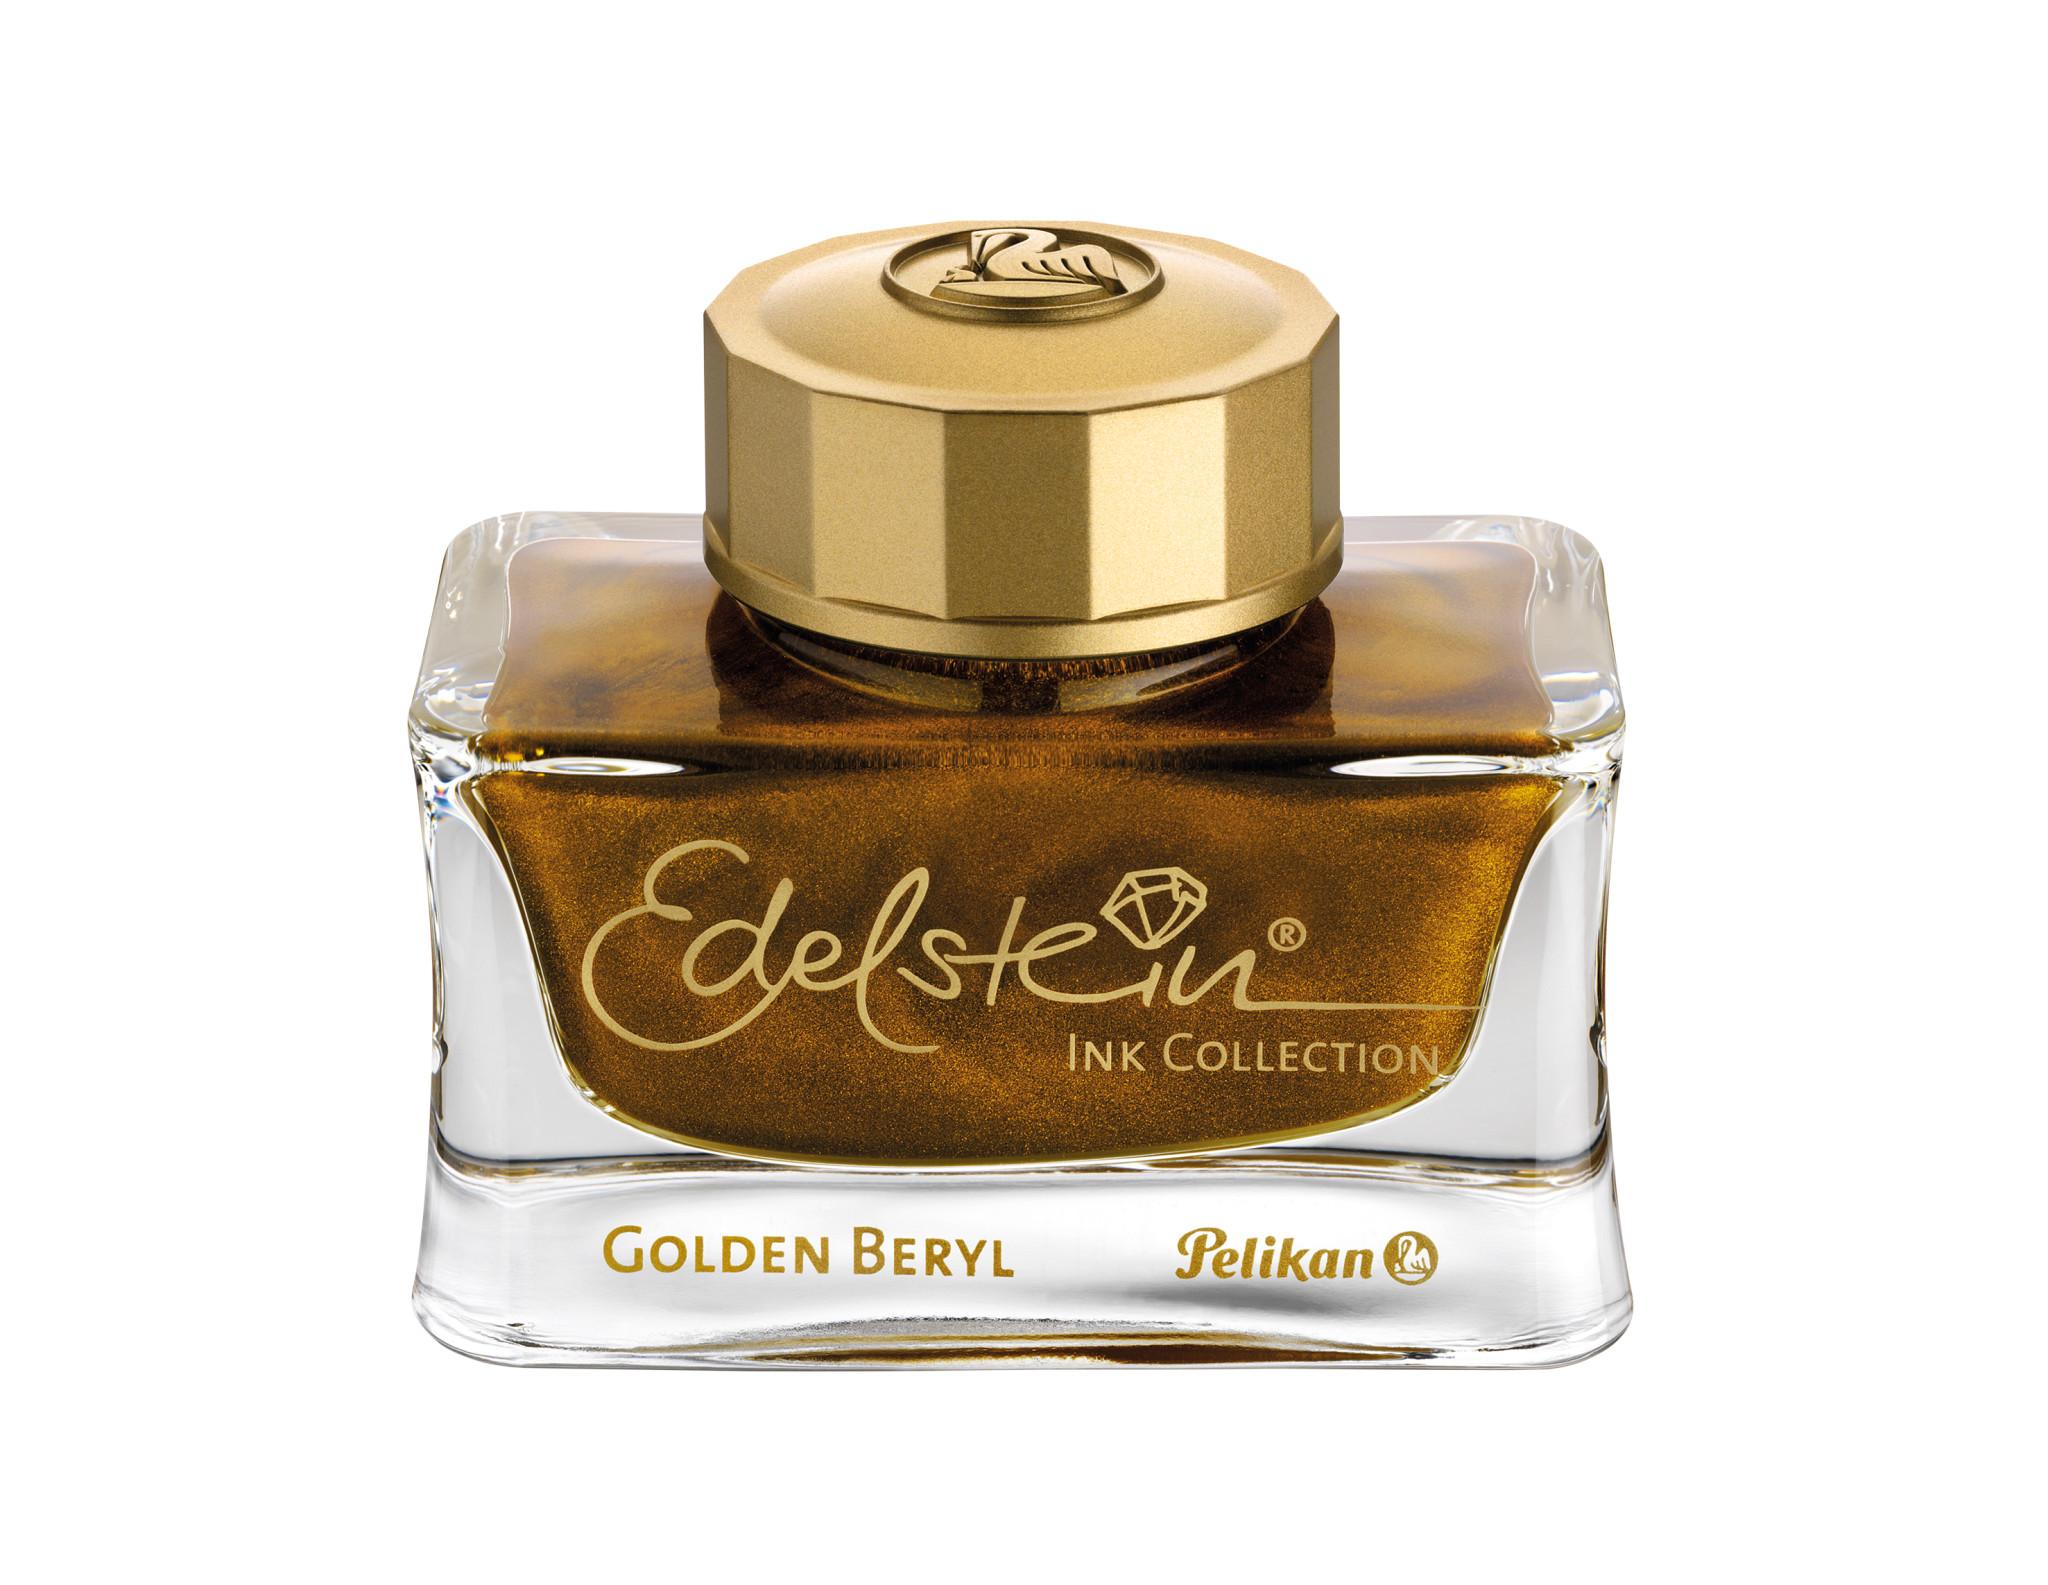 Pelikan Edelstein Golden Beryl 50ml